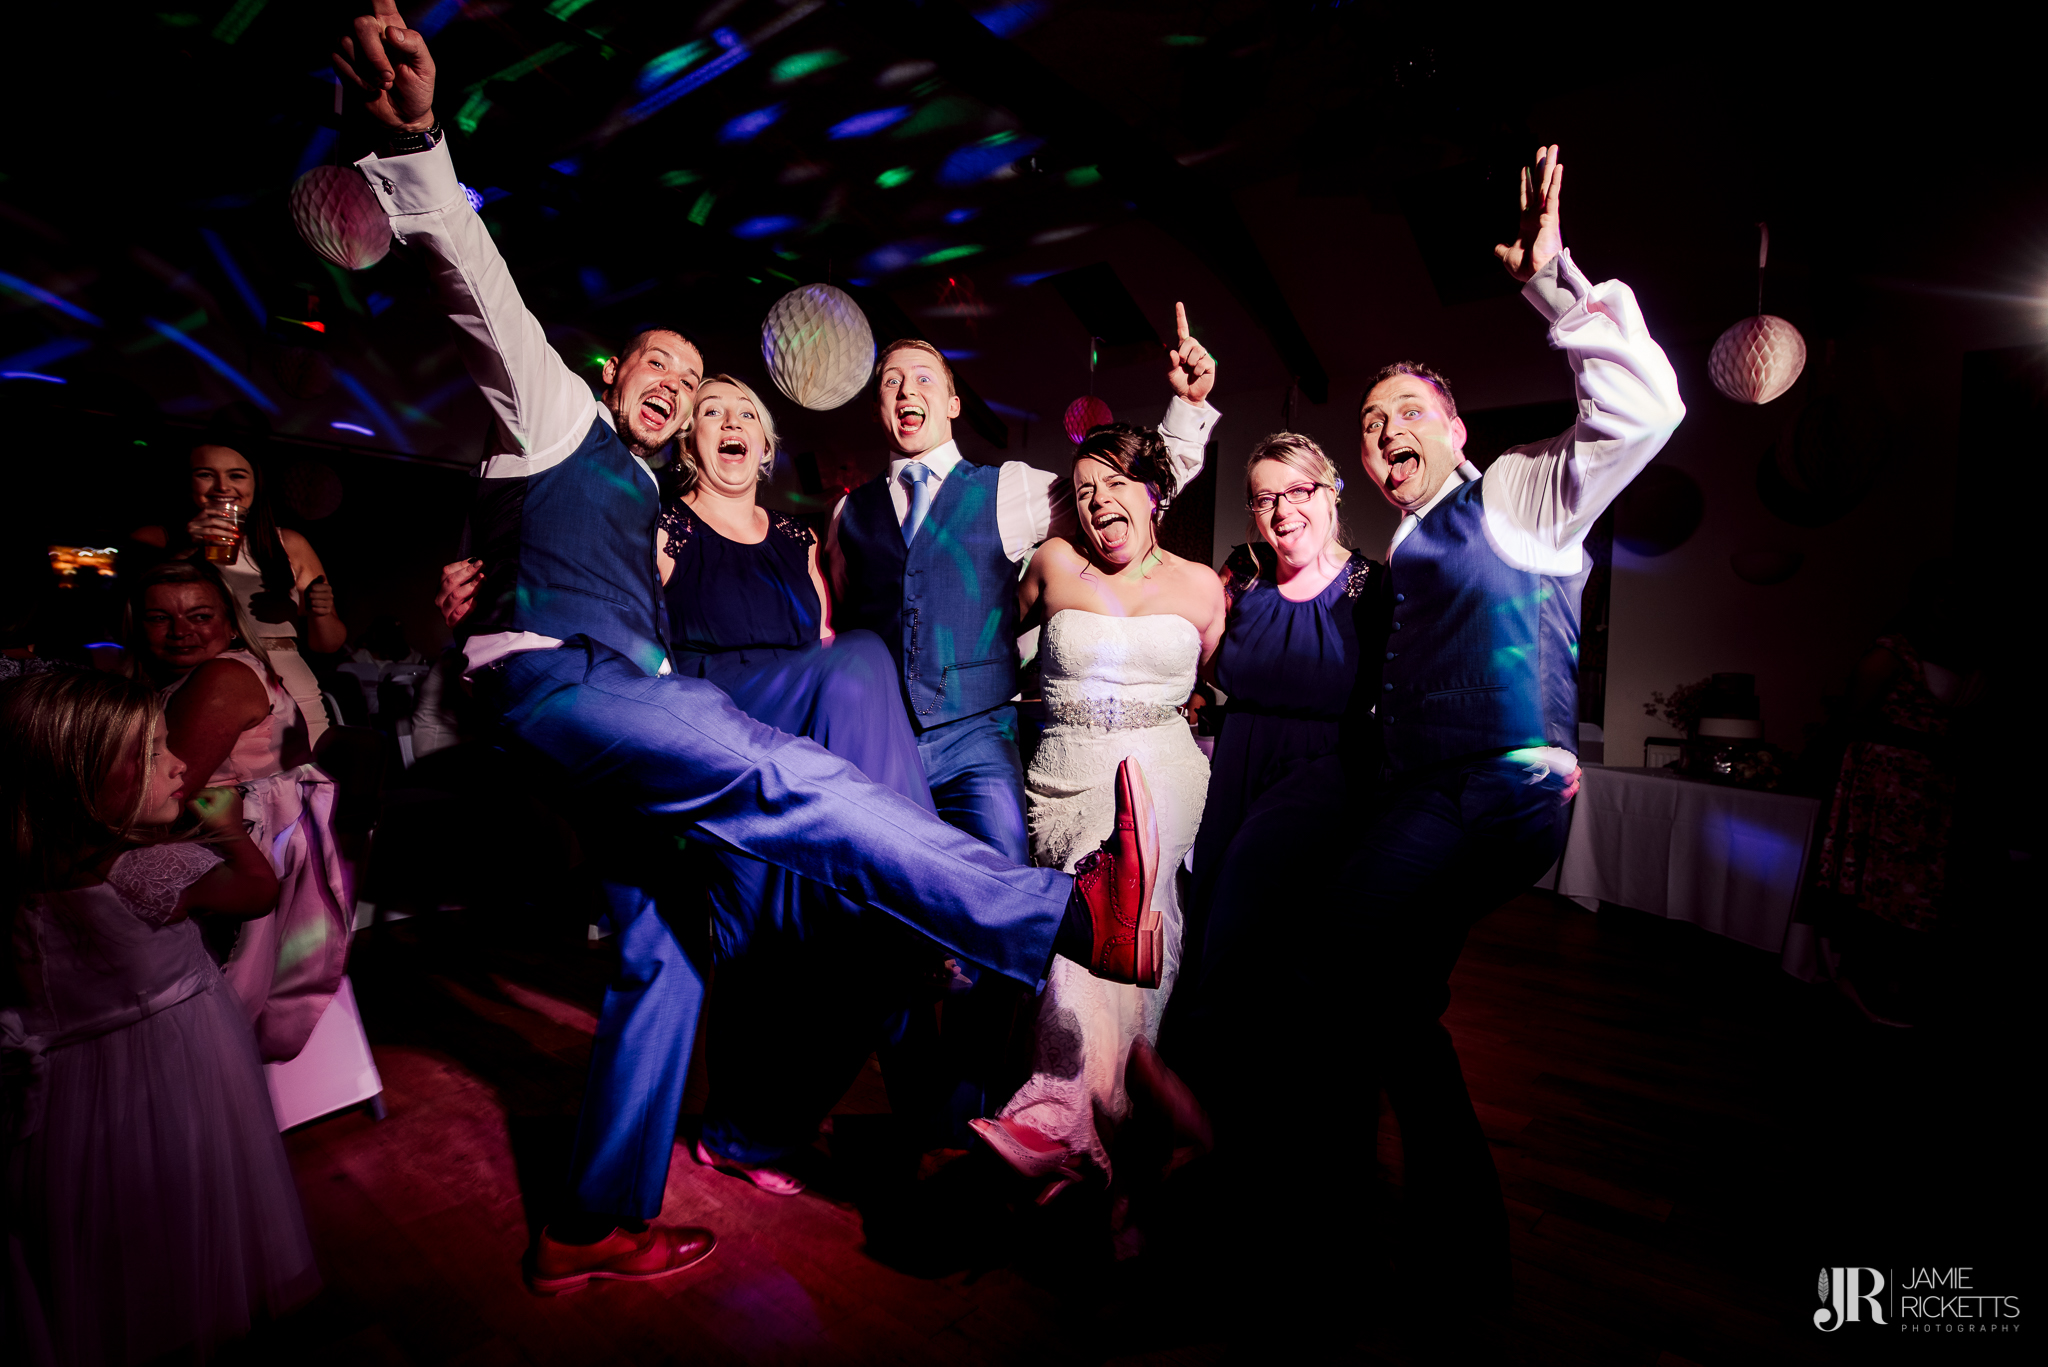 Wedding-Photographer-Shropshire-9.JPG